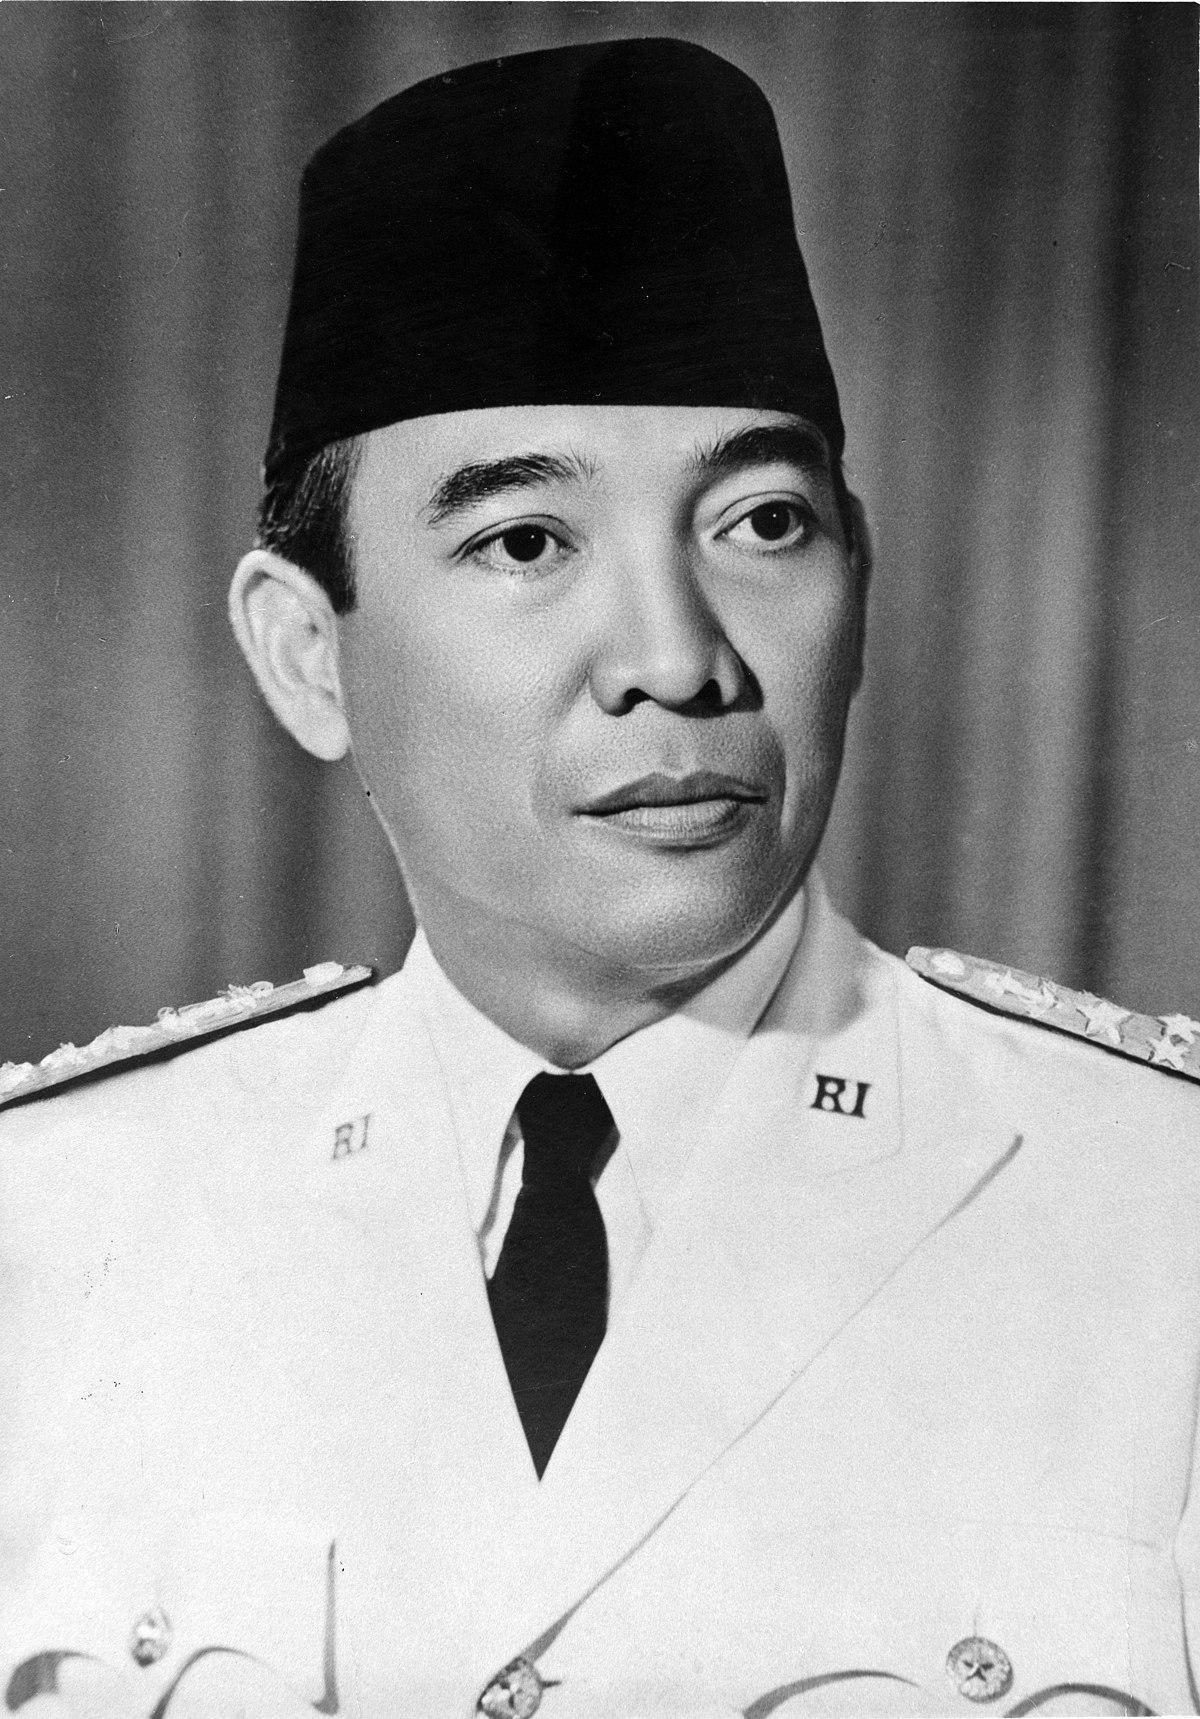 Peran Moh Hatta Dalam Bpupki : peran, hatta, dalam, bpupki, Sukarno, Wikipedia